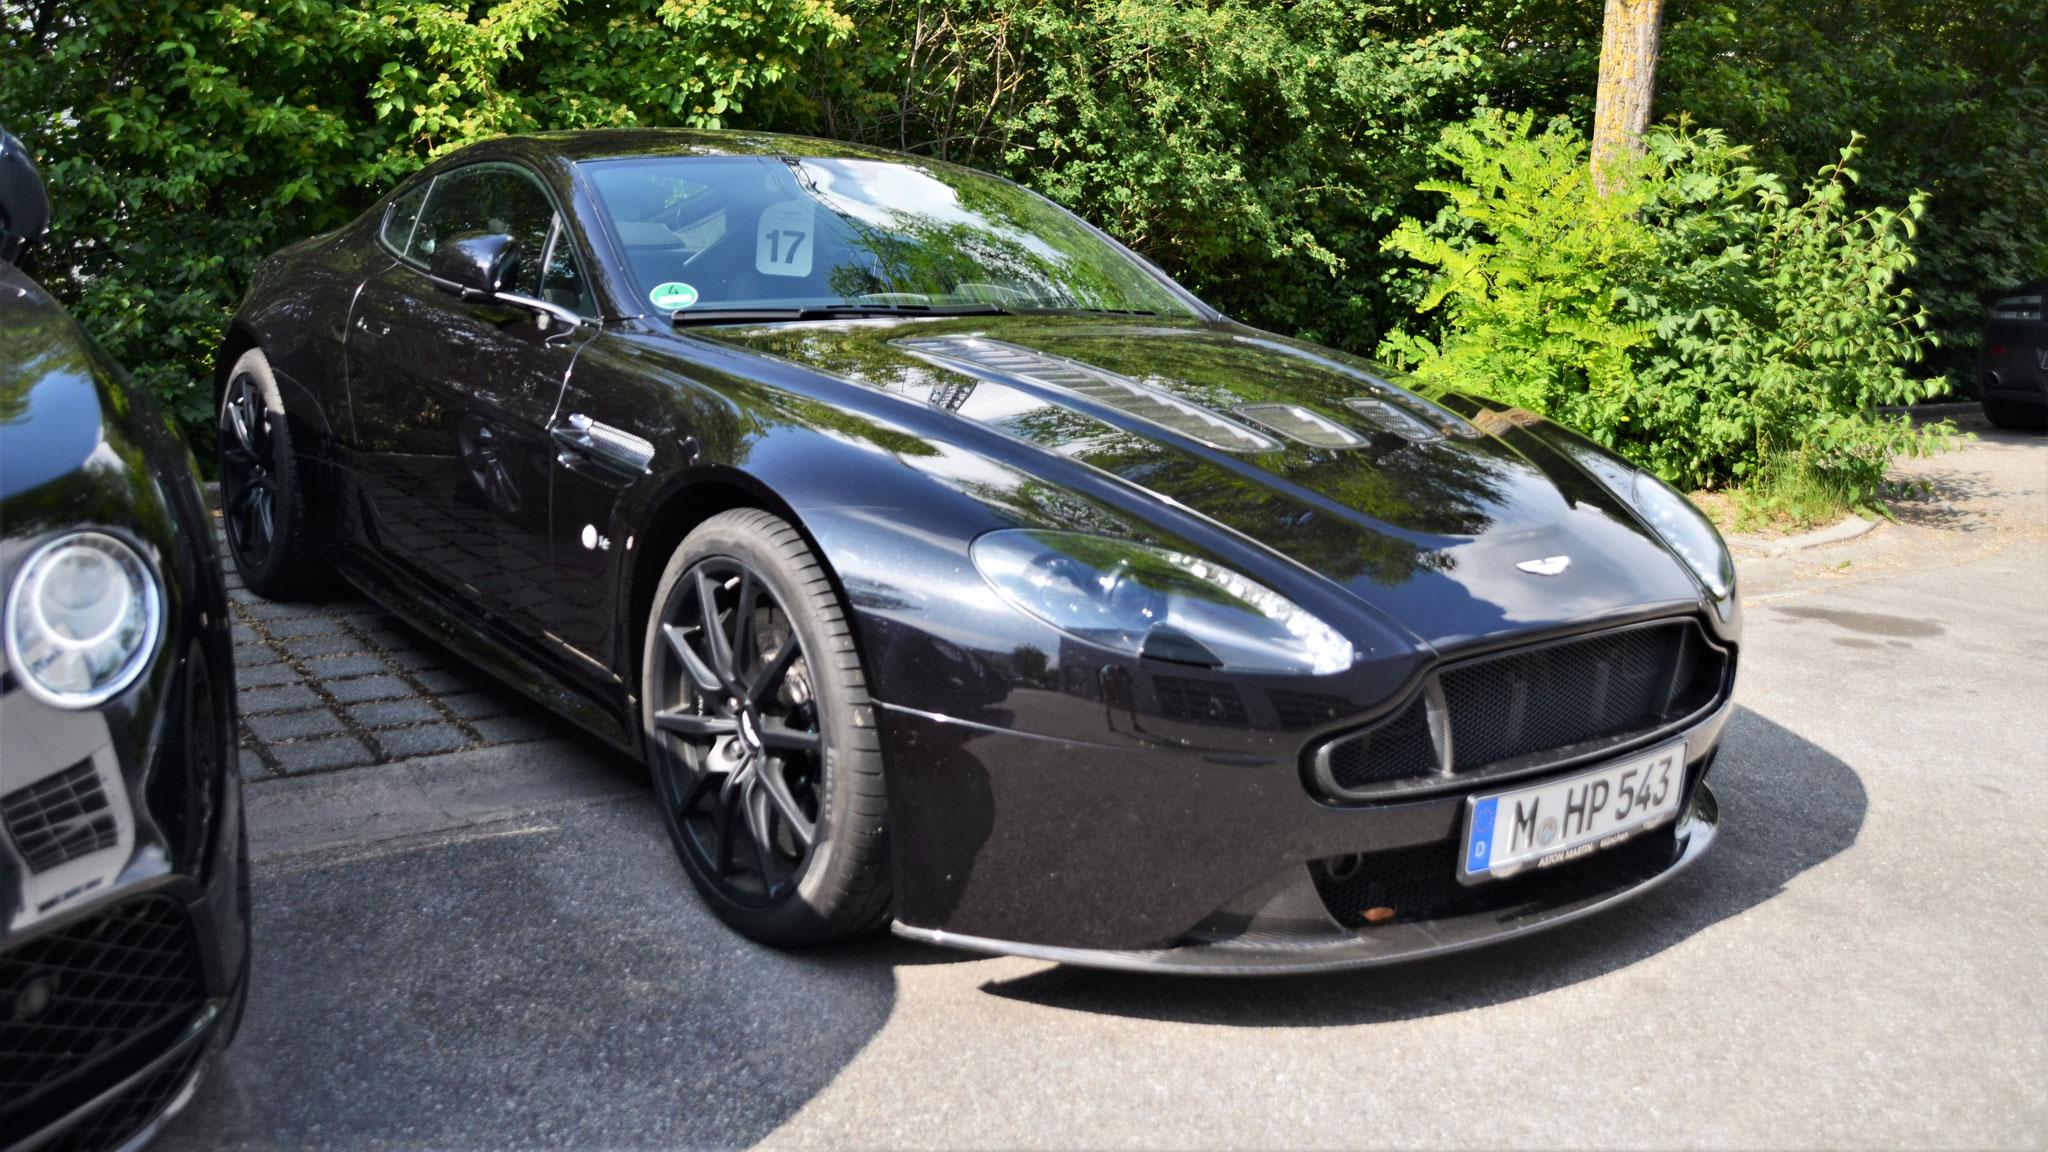 Aston Martin Vantage V12 - M-HP-543